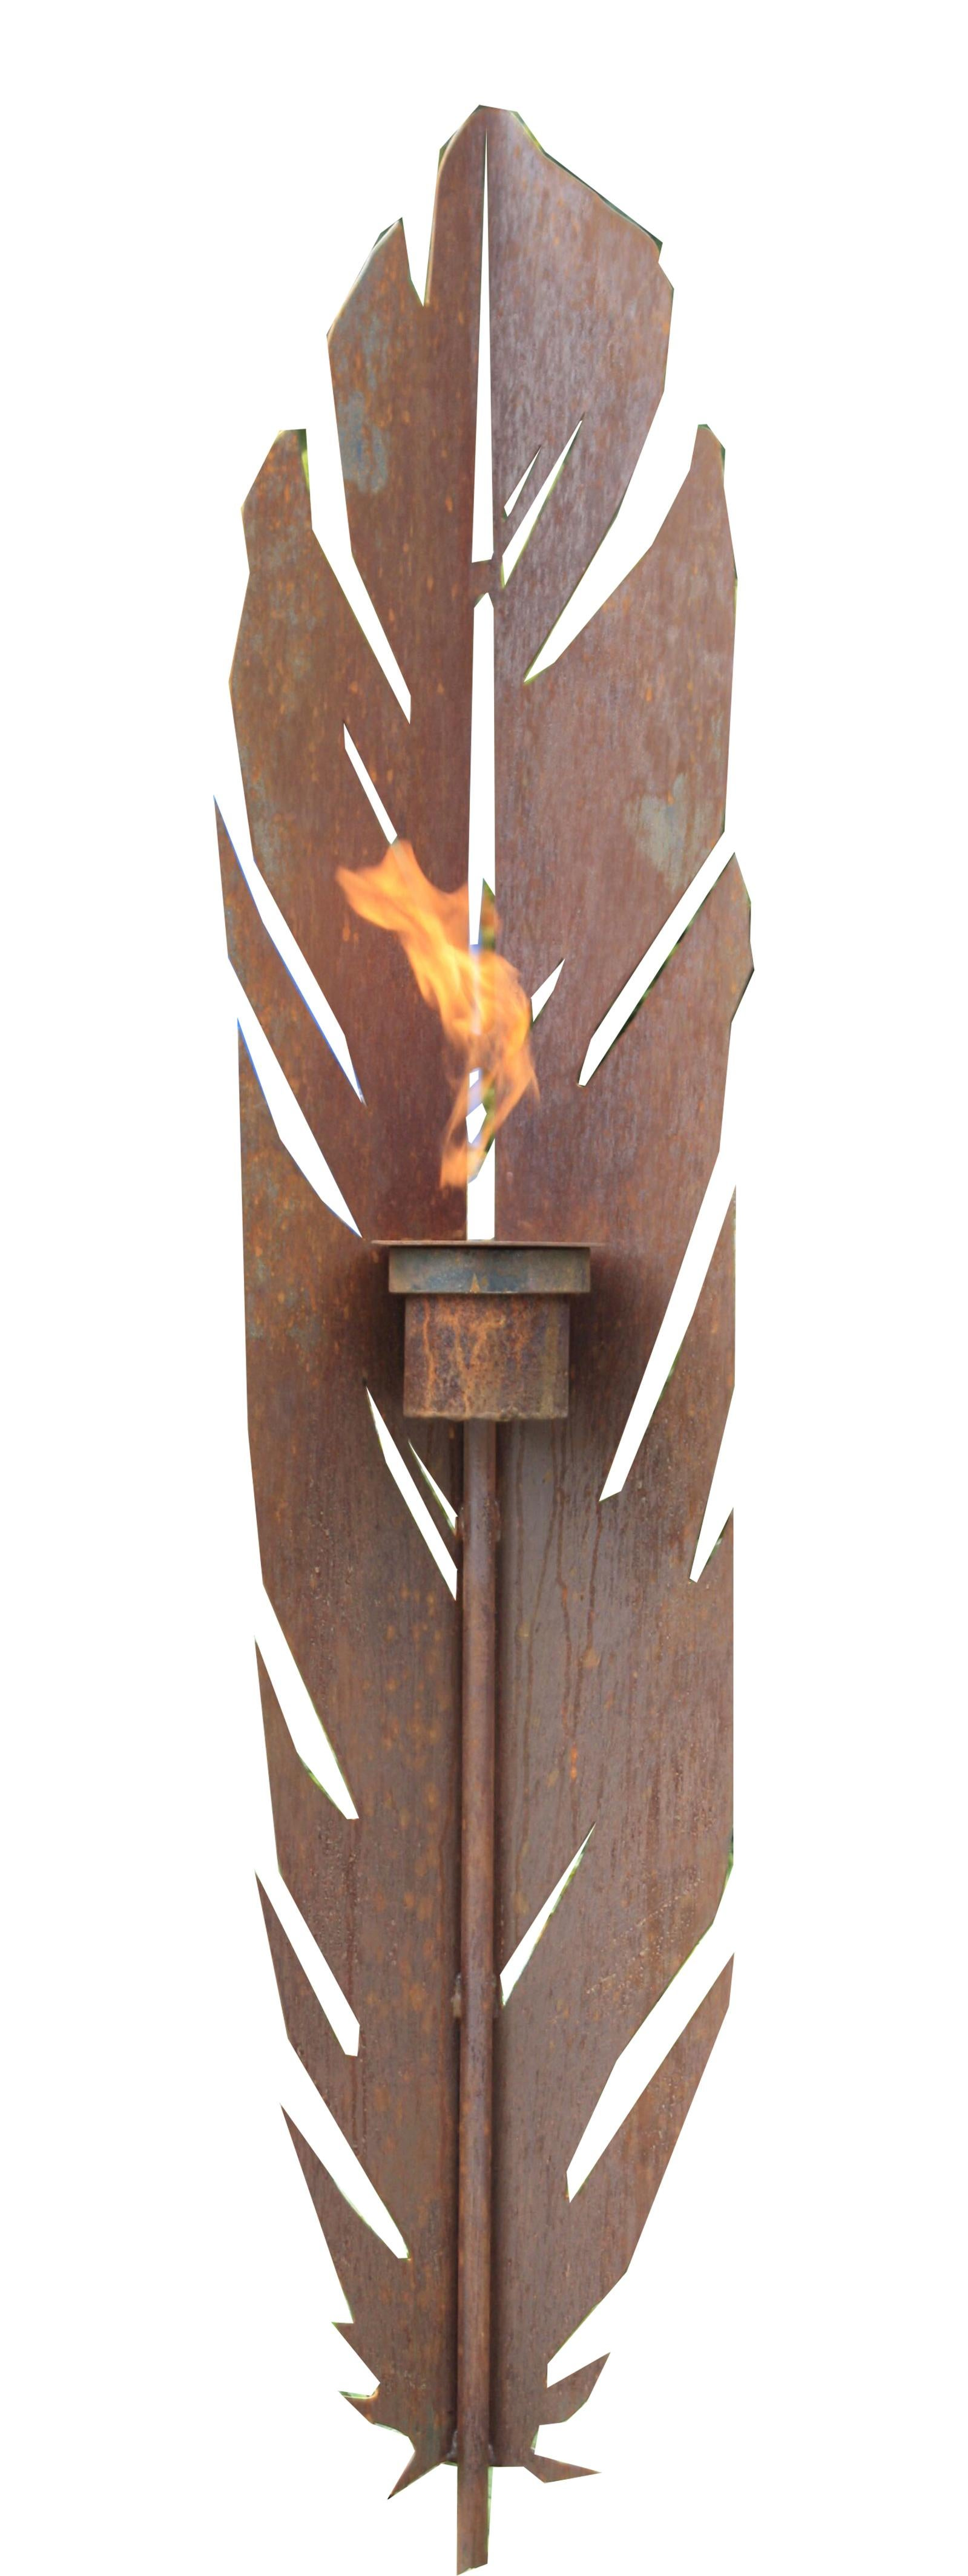 Feather contemporary sculpture